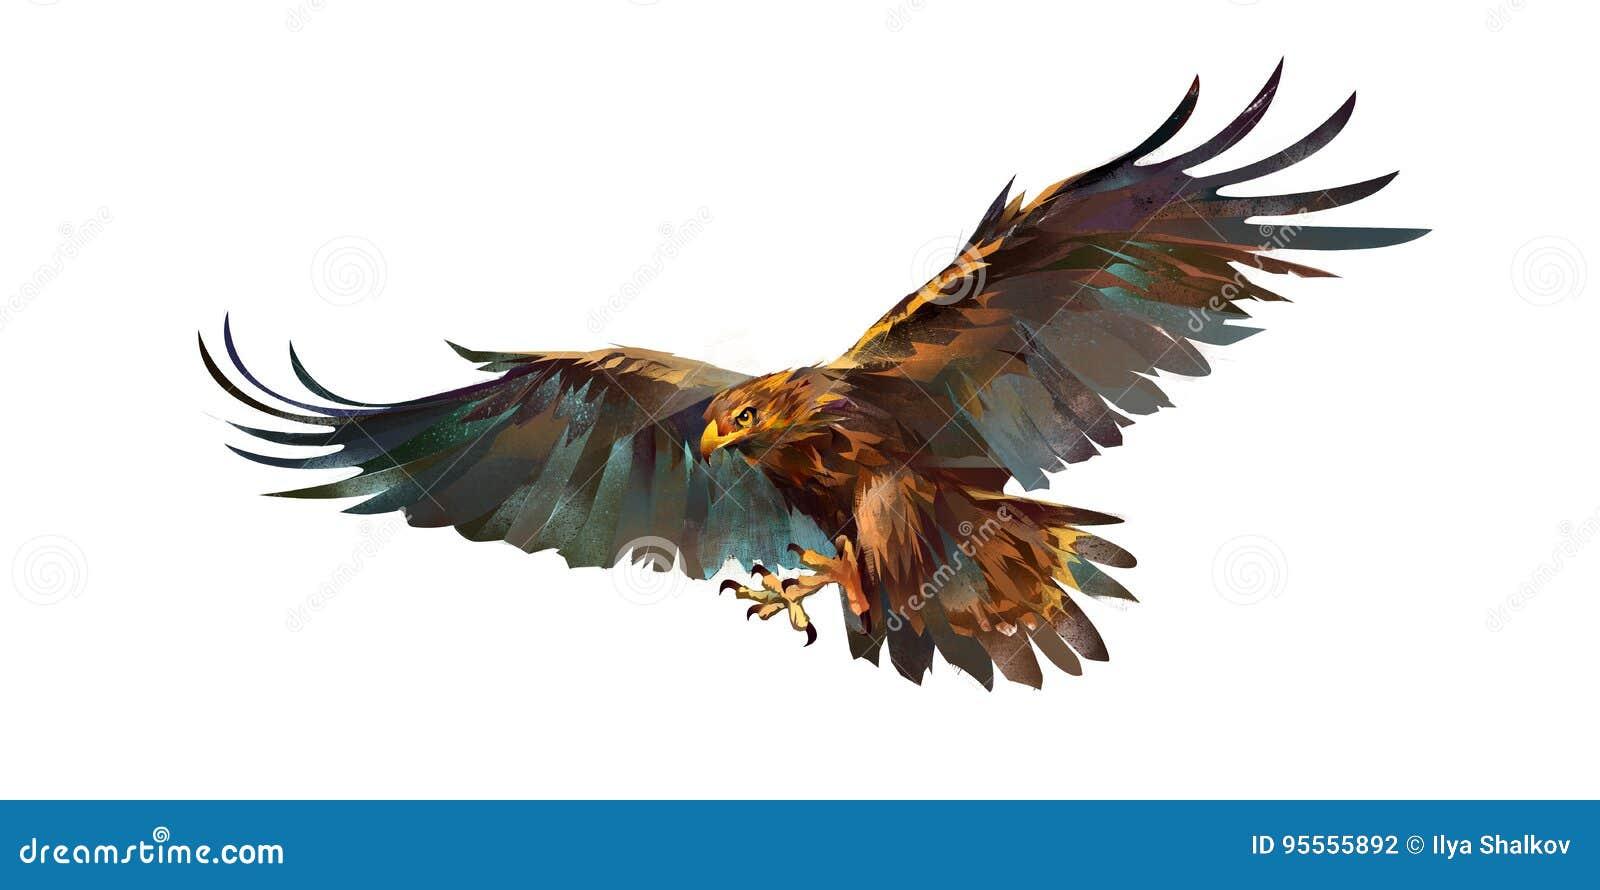 drawing flying eagle on white background stock illustration